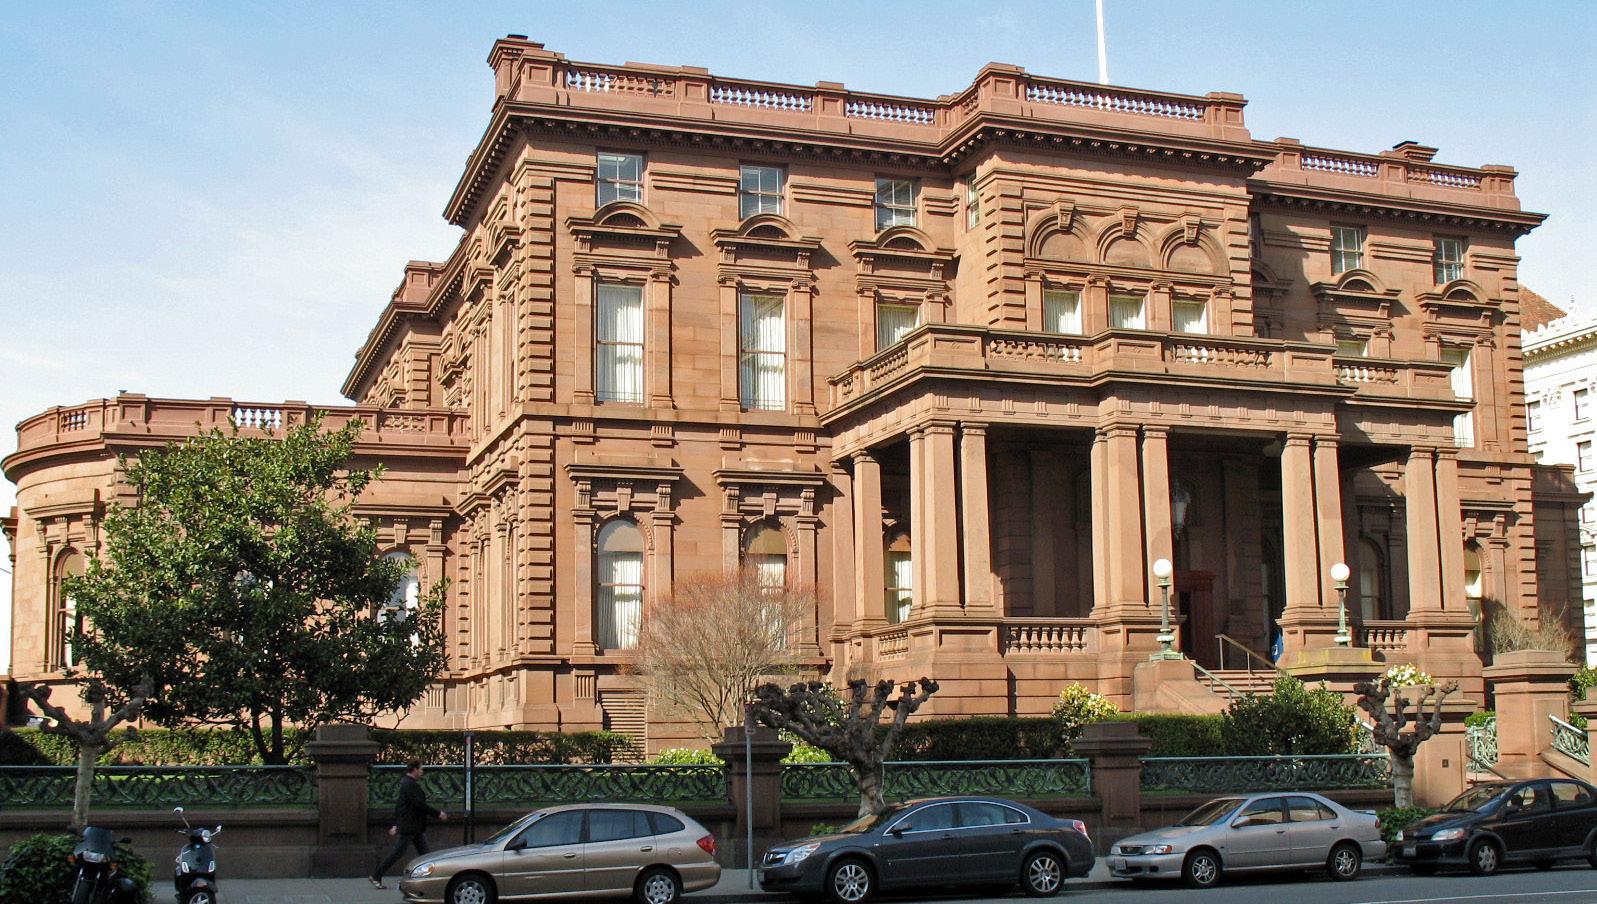 """James Flood Mansion (San Francisco) 4"" by Sanfranman59 - Own work. Licensed under GFDL via Wikimedia Commons - http://commons.wikimedia.org/wiki/File:James_Flood_Mansion_(San_Francisco)_4.JPG#/media/File:James_Flood_Mansion_(San_Francisco)_4.JPG"